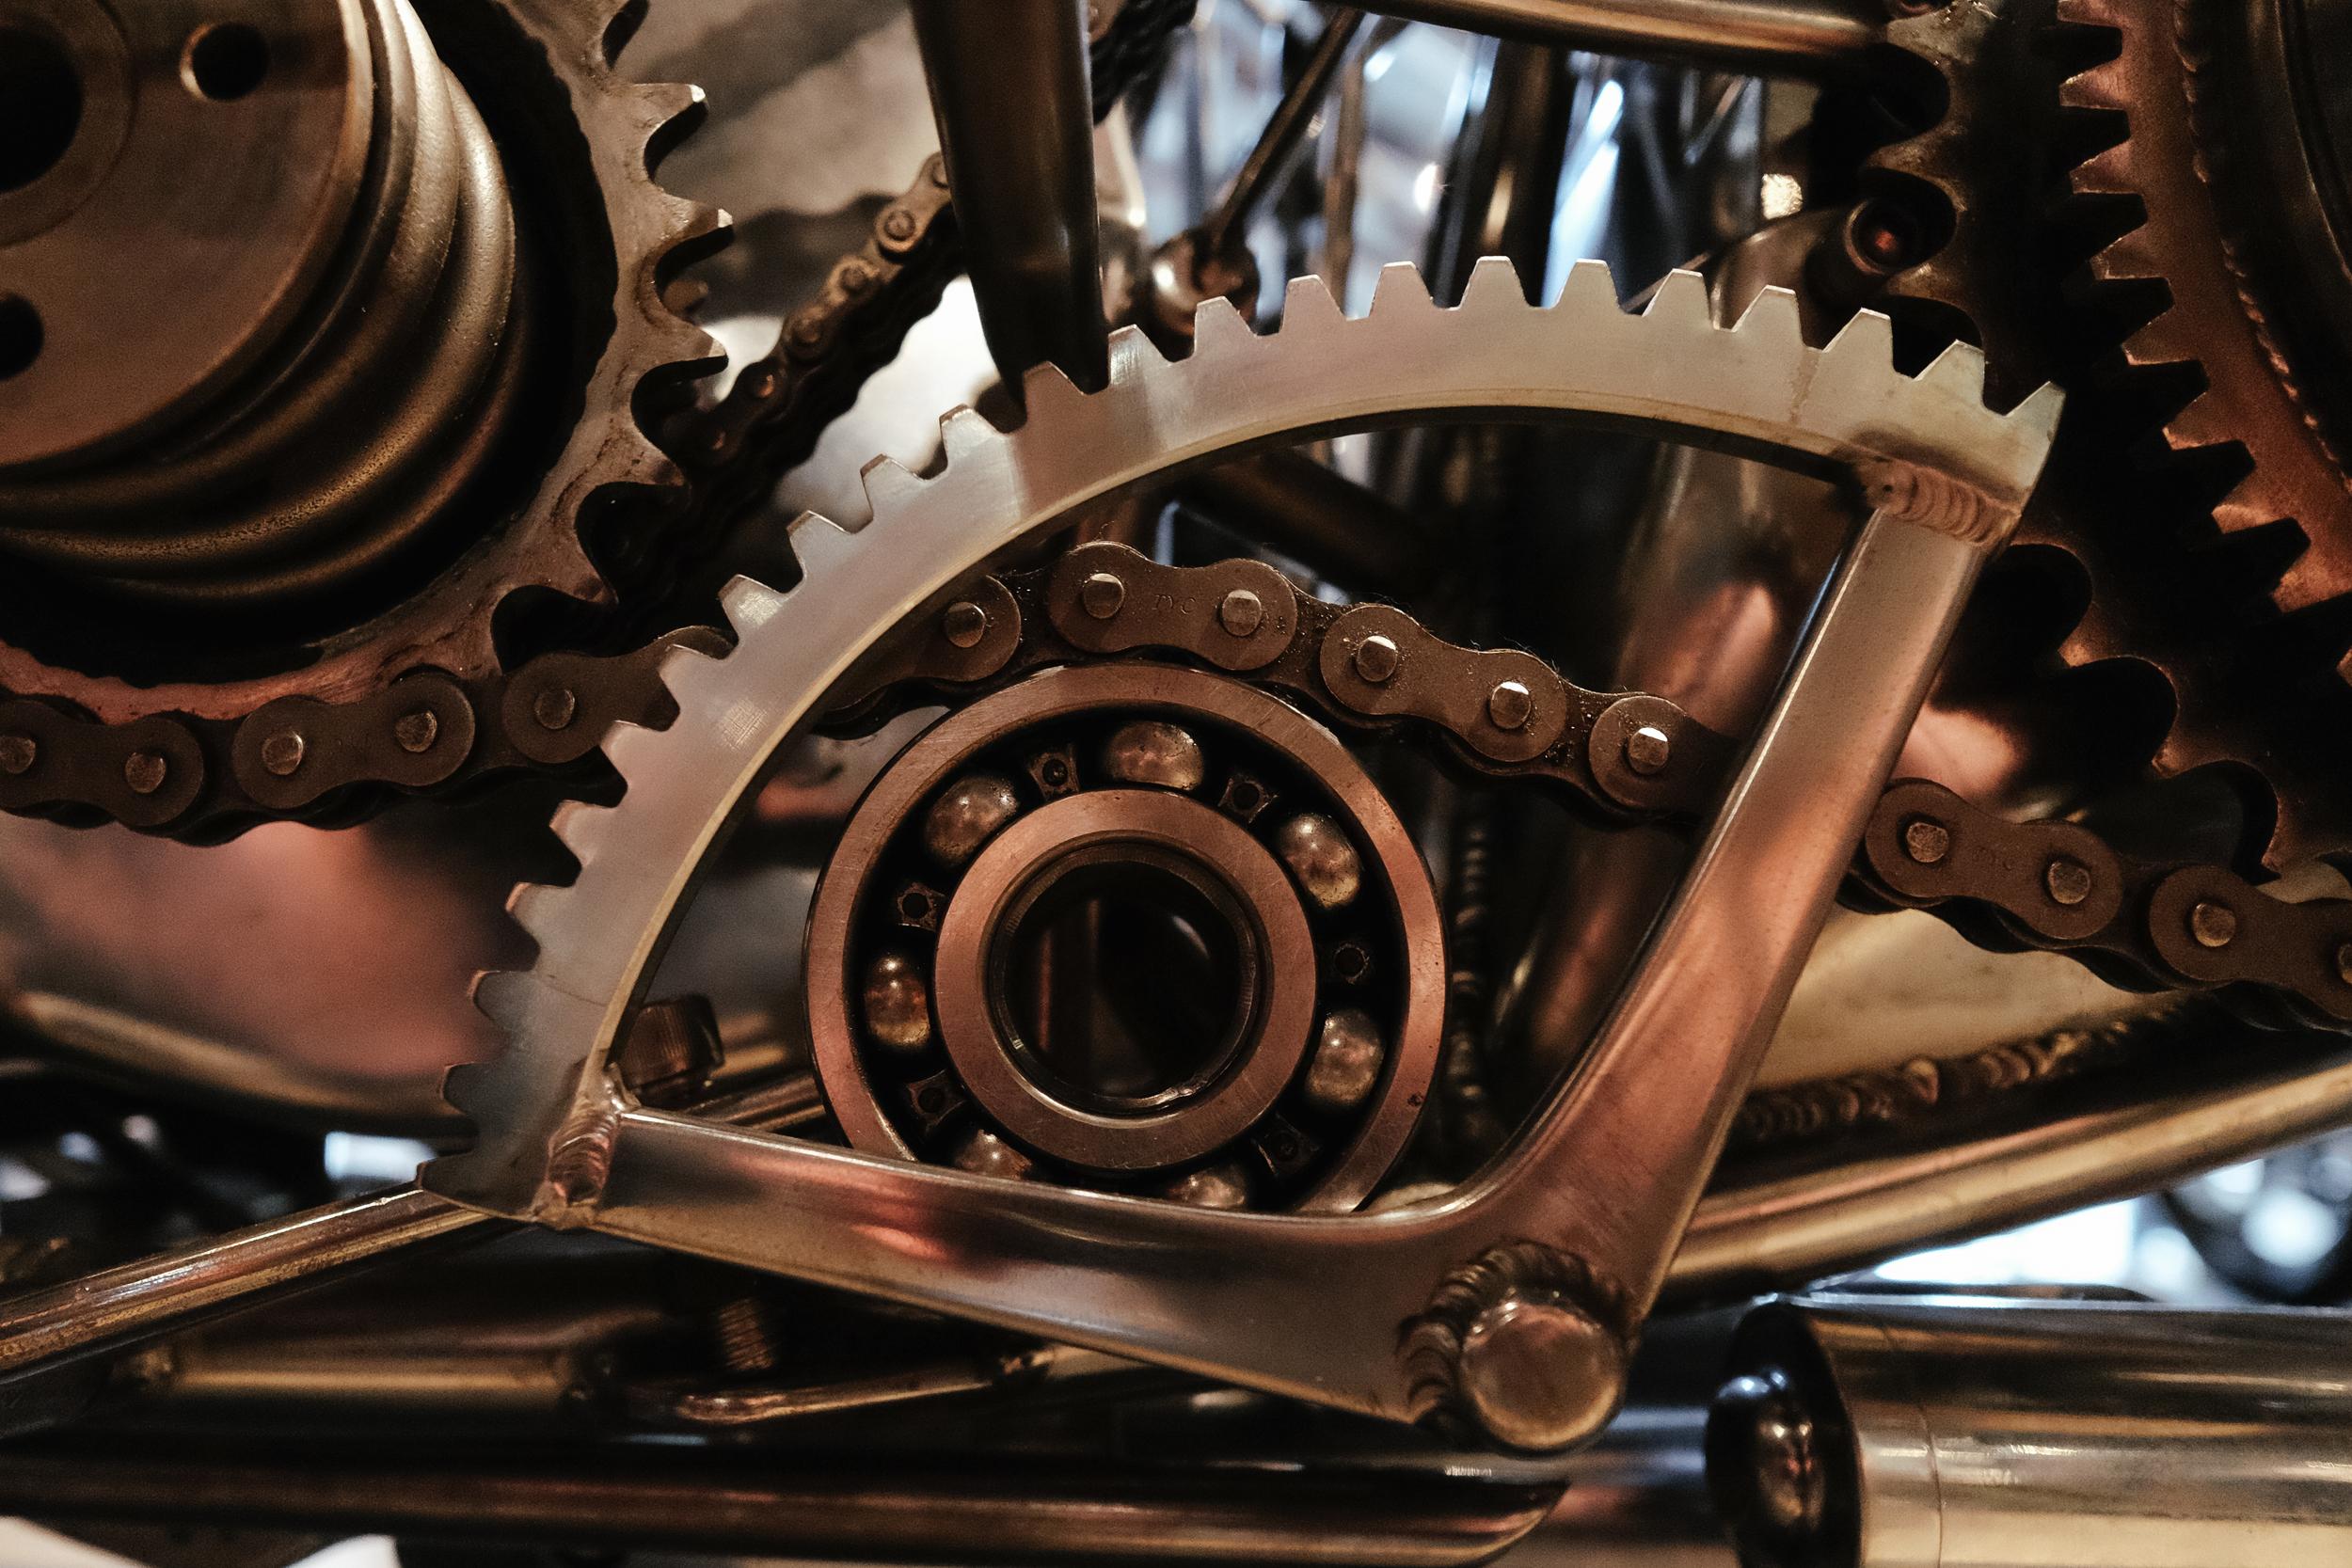 Handbuilt-Motorcycle-Show-2015-8146.jpg